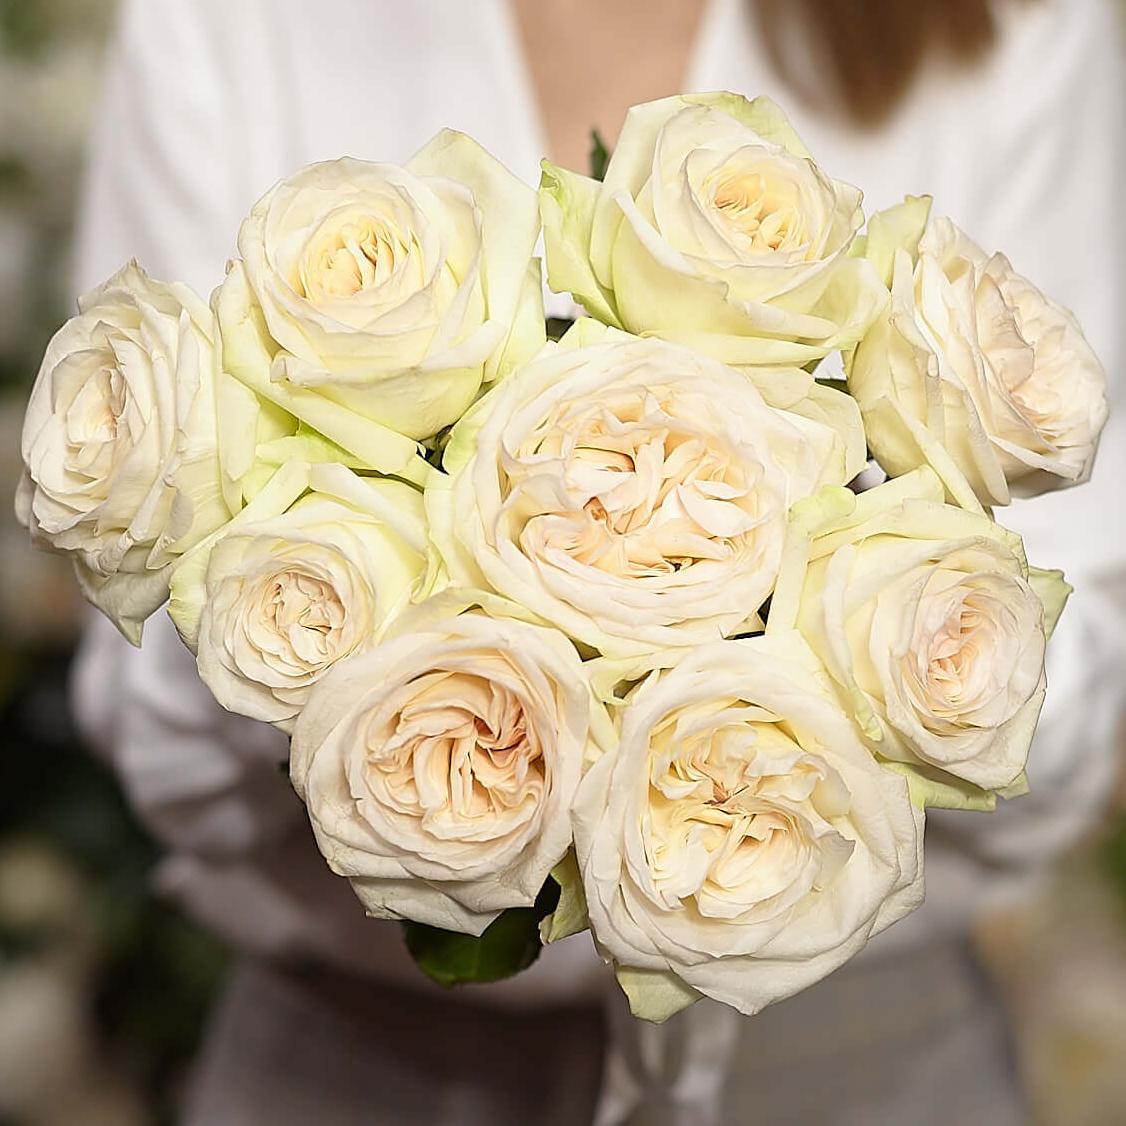 9 белых ароматных пионовидных роз White O'Hara 40 см фото